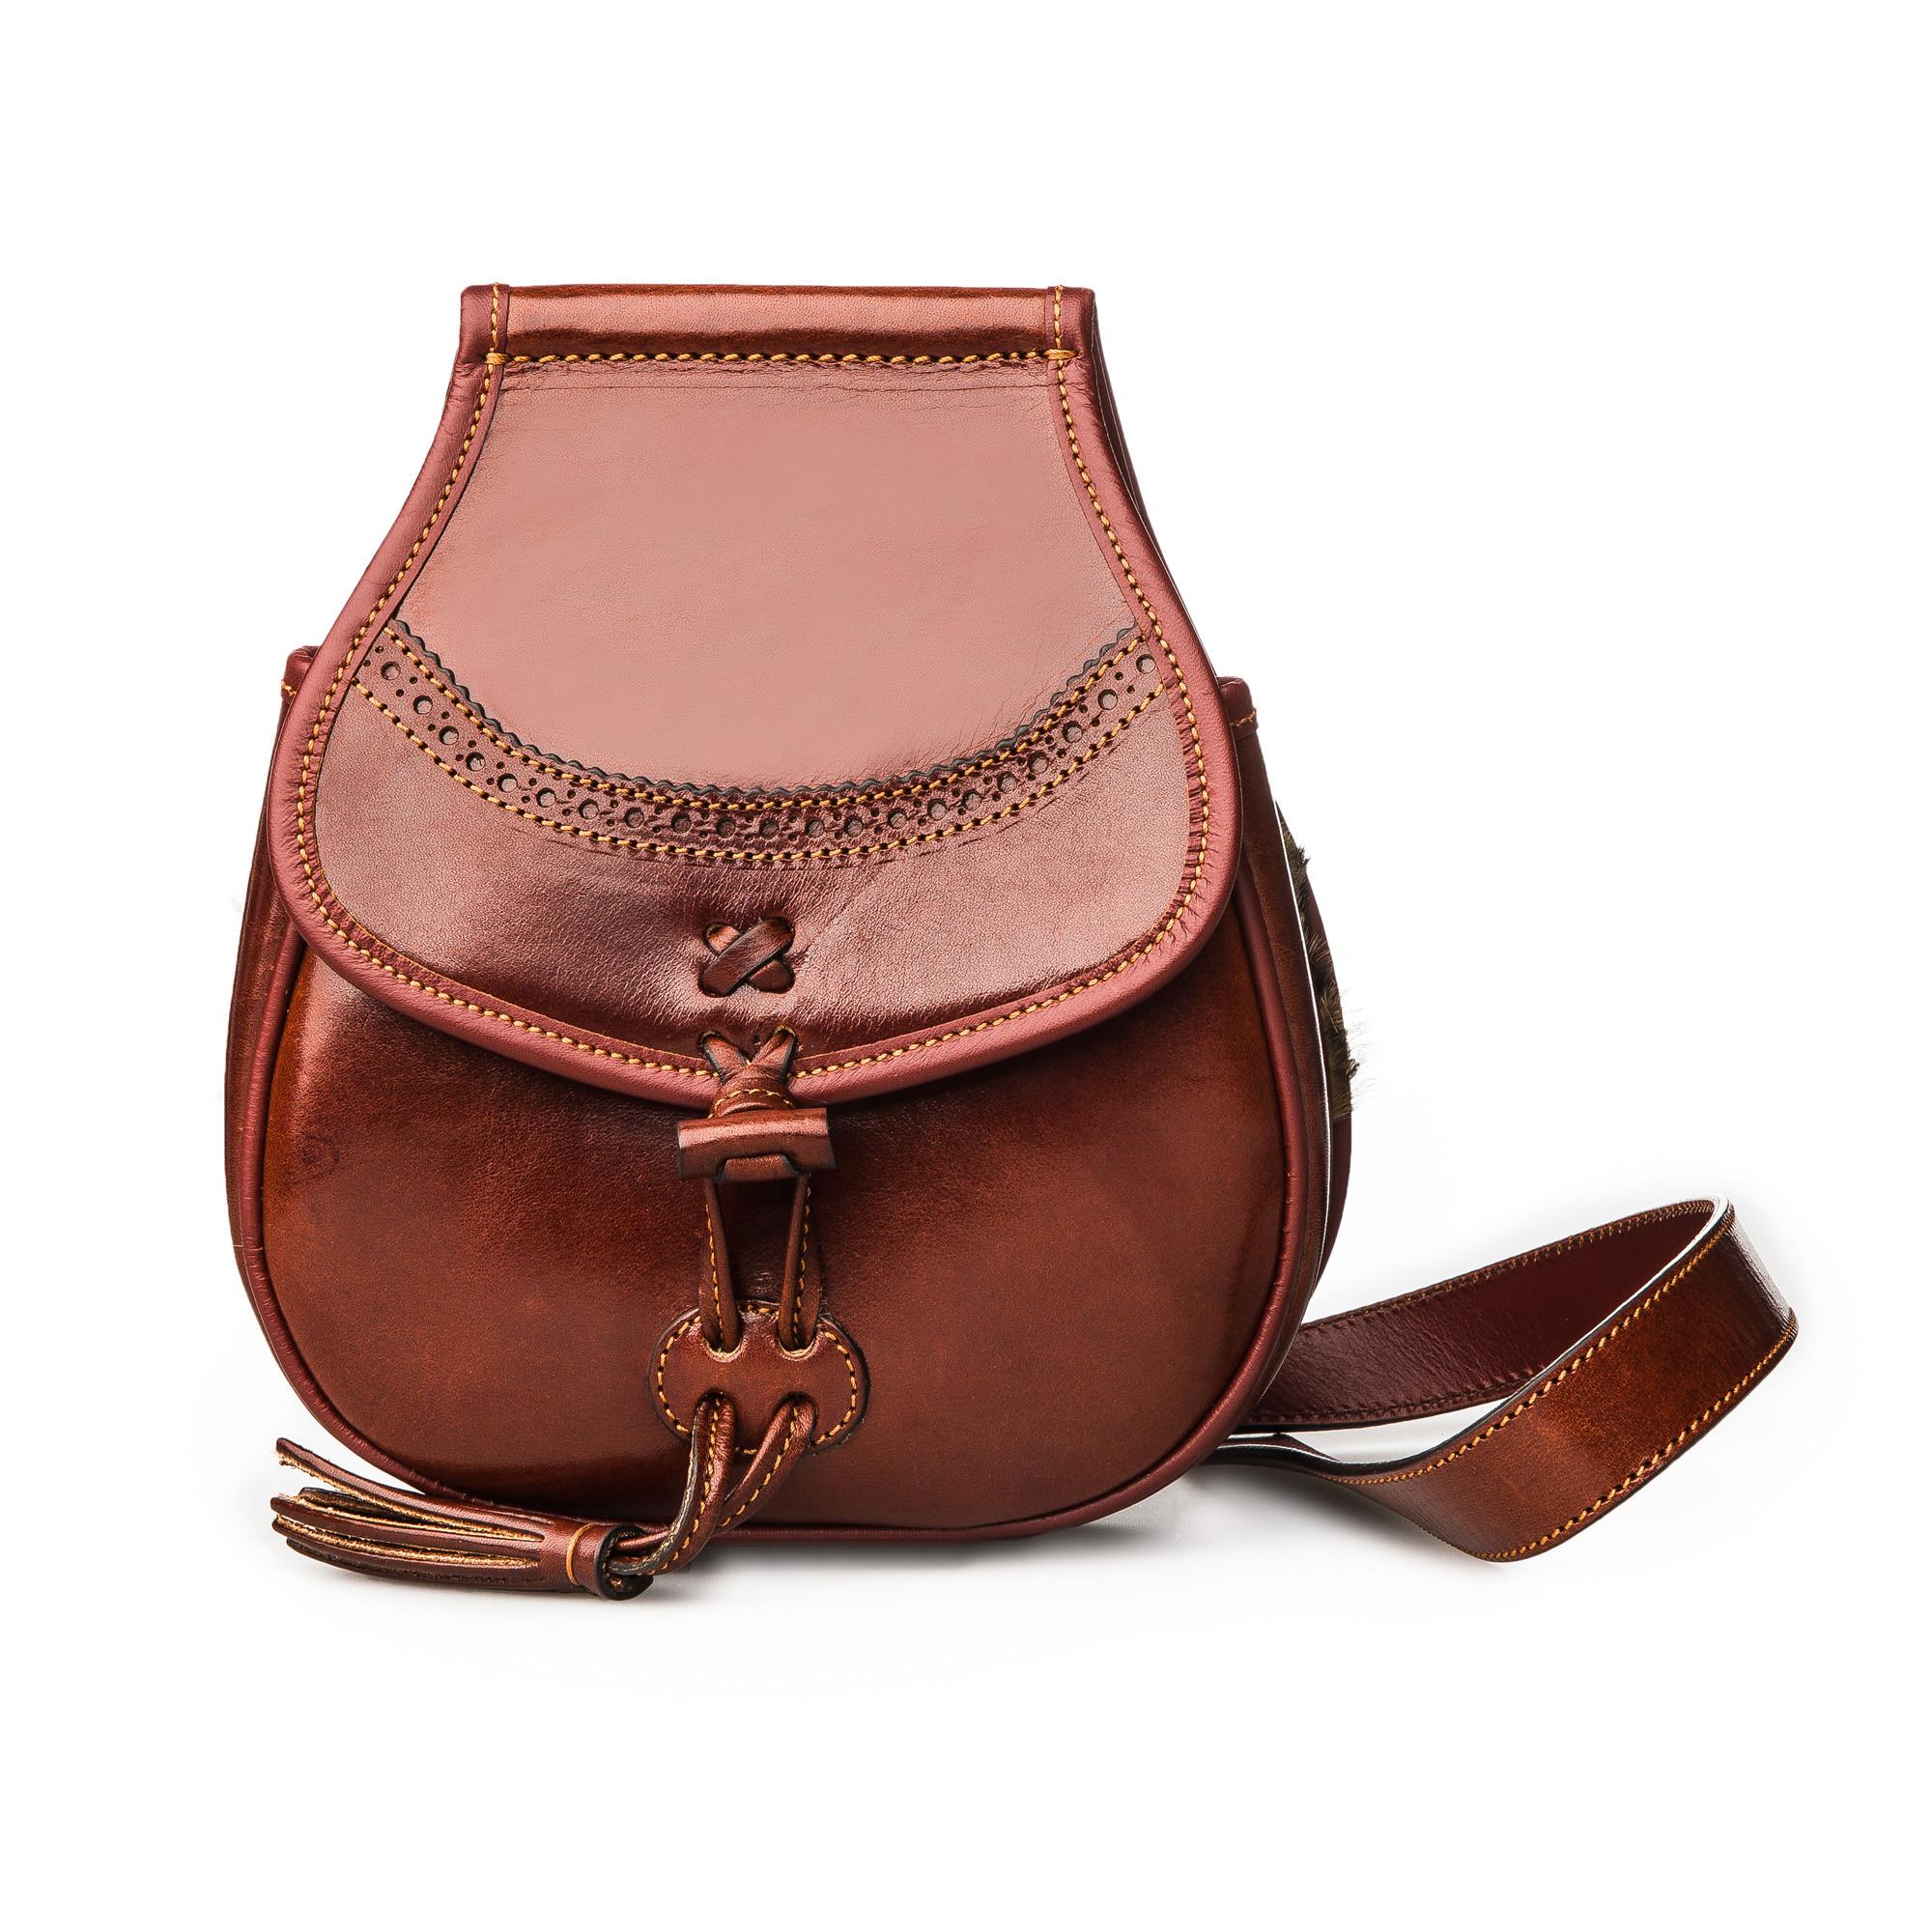 9d0f748b23 T.ba Leather   Fur Hand Warming Bag - Bronze